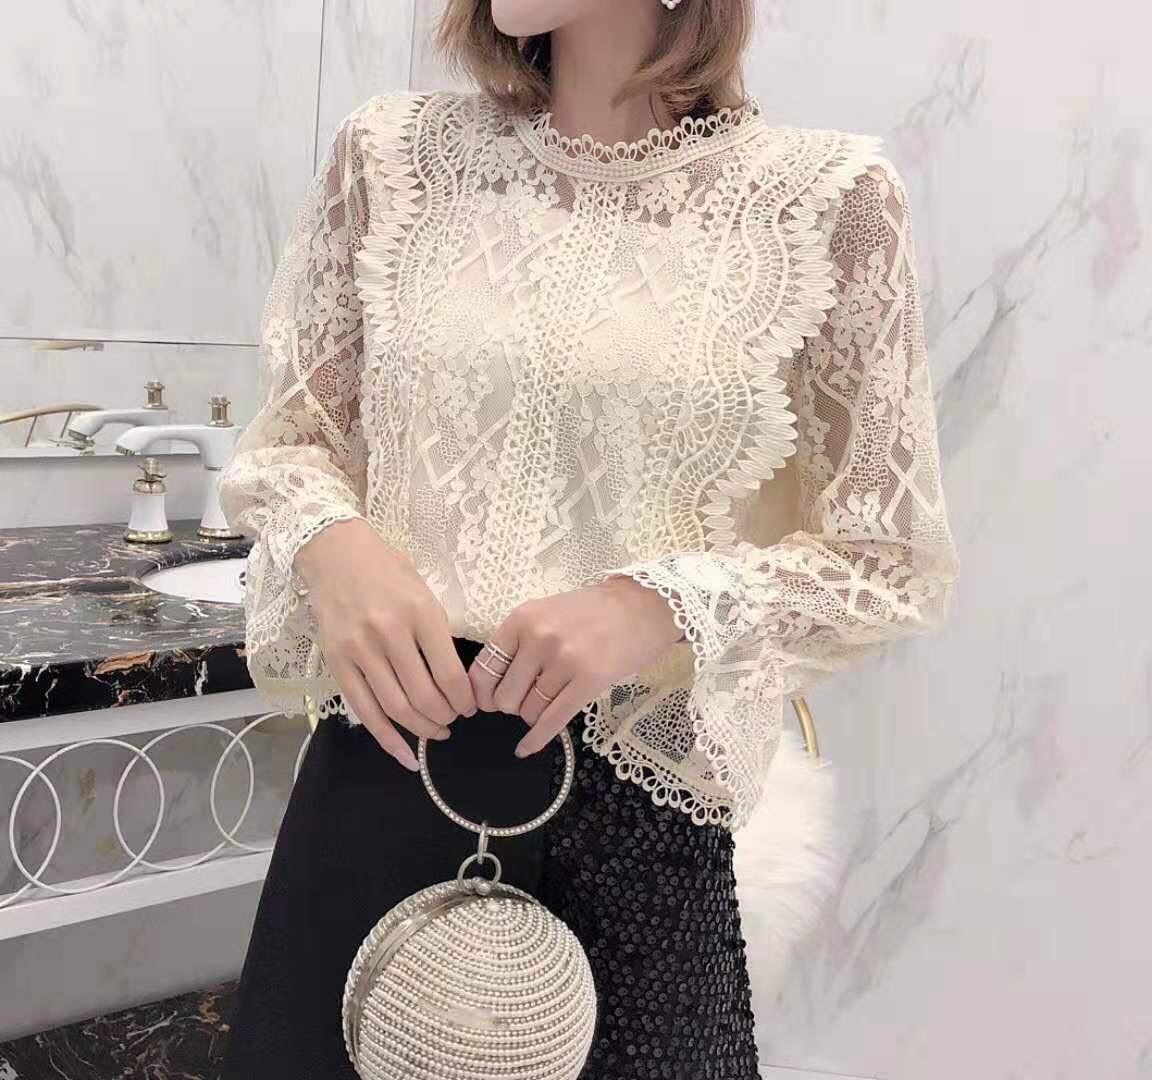 Ажурная блузка с расклешенным рукавом 42-46 (в расцветках)